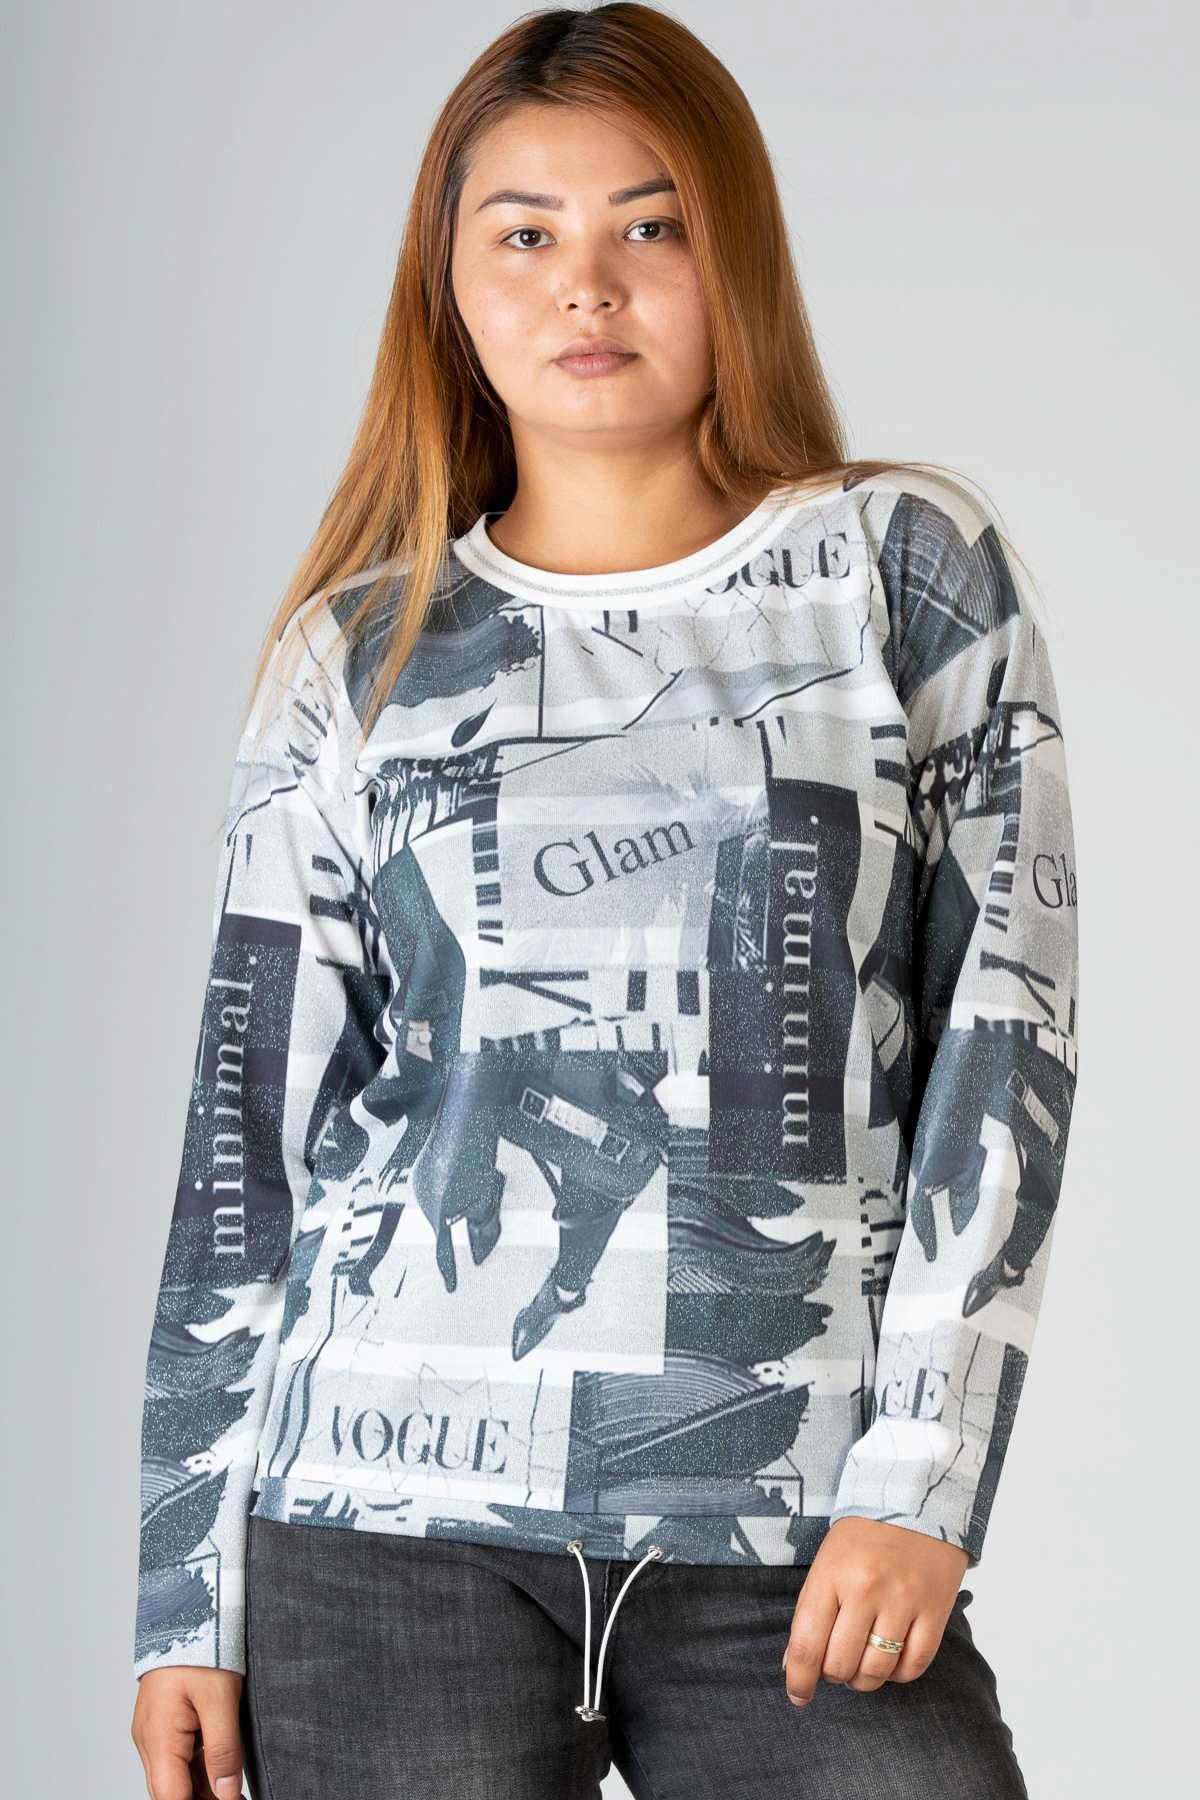 Sogo Plus Size Women's Blouse, Shirt, Womens Tops and Blouses, блузка женская, Blouses, Blusas, блузка женская, кофта